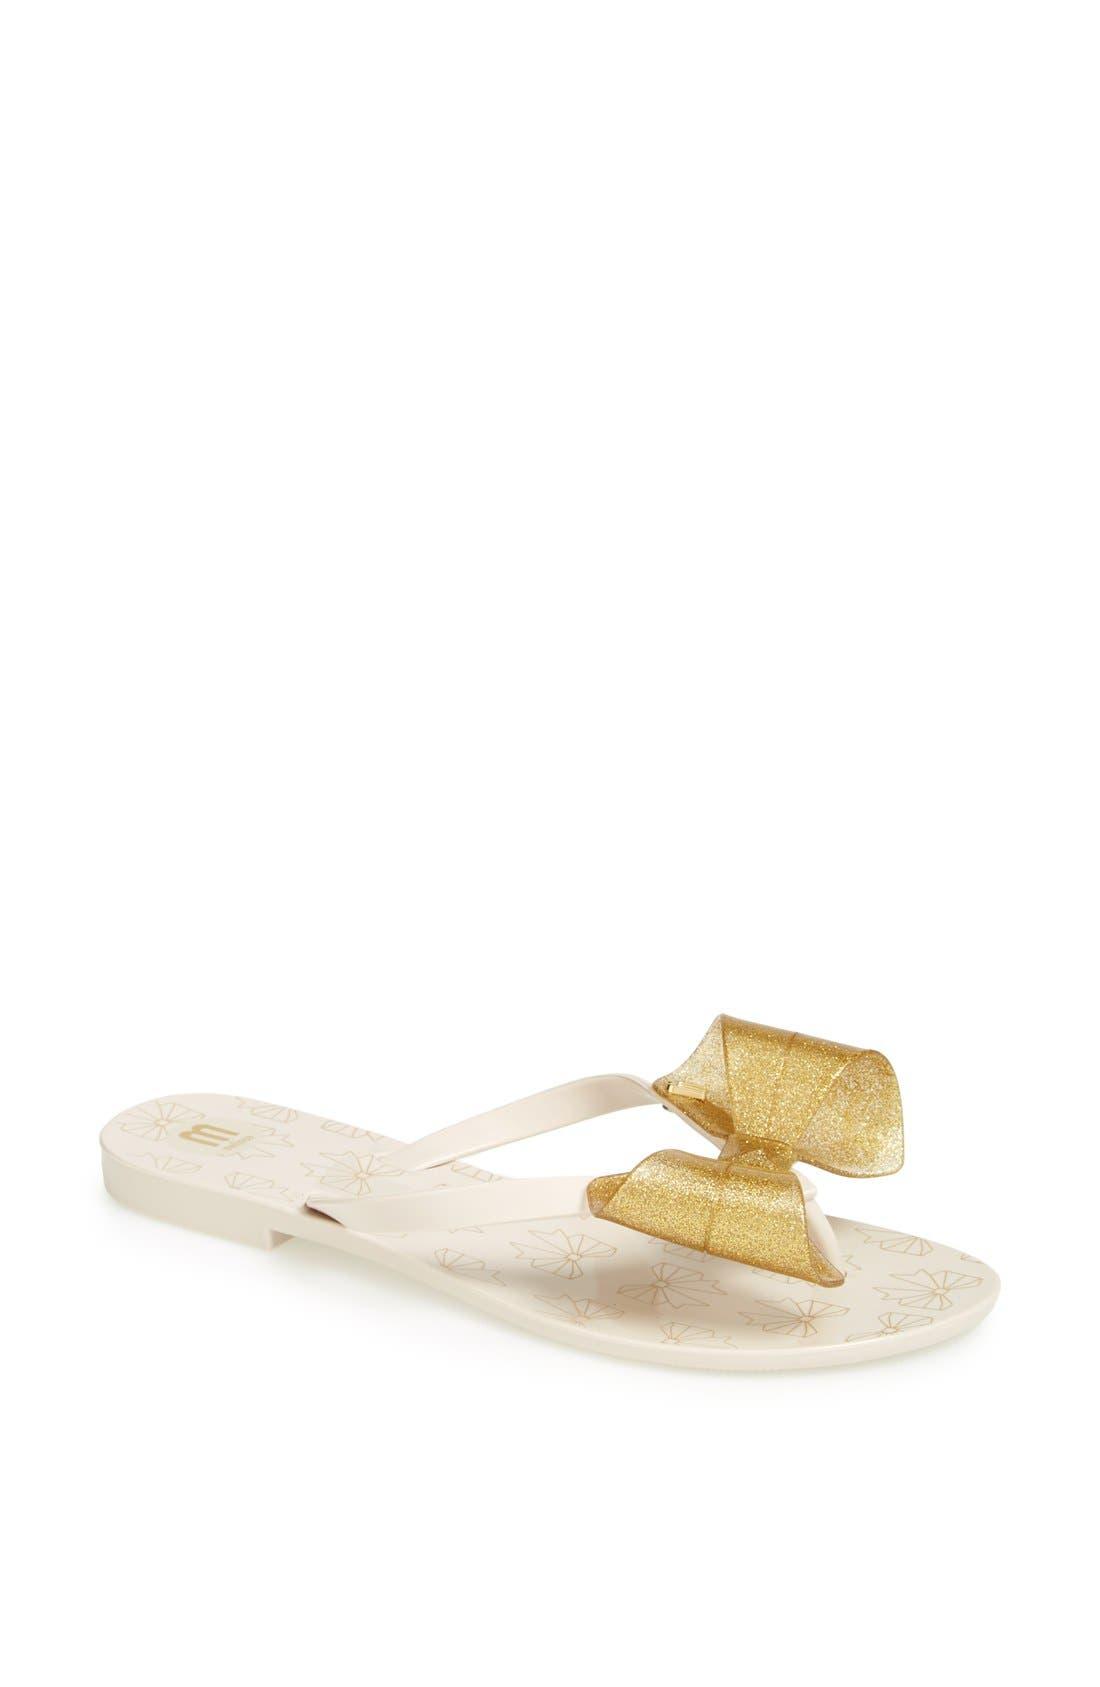 Alternate Image 1 Selected - Melissa 'Harmonic IV' Jelly Thong Sandal